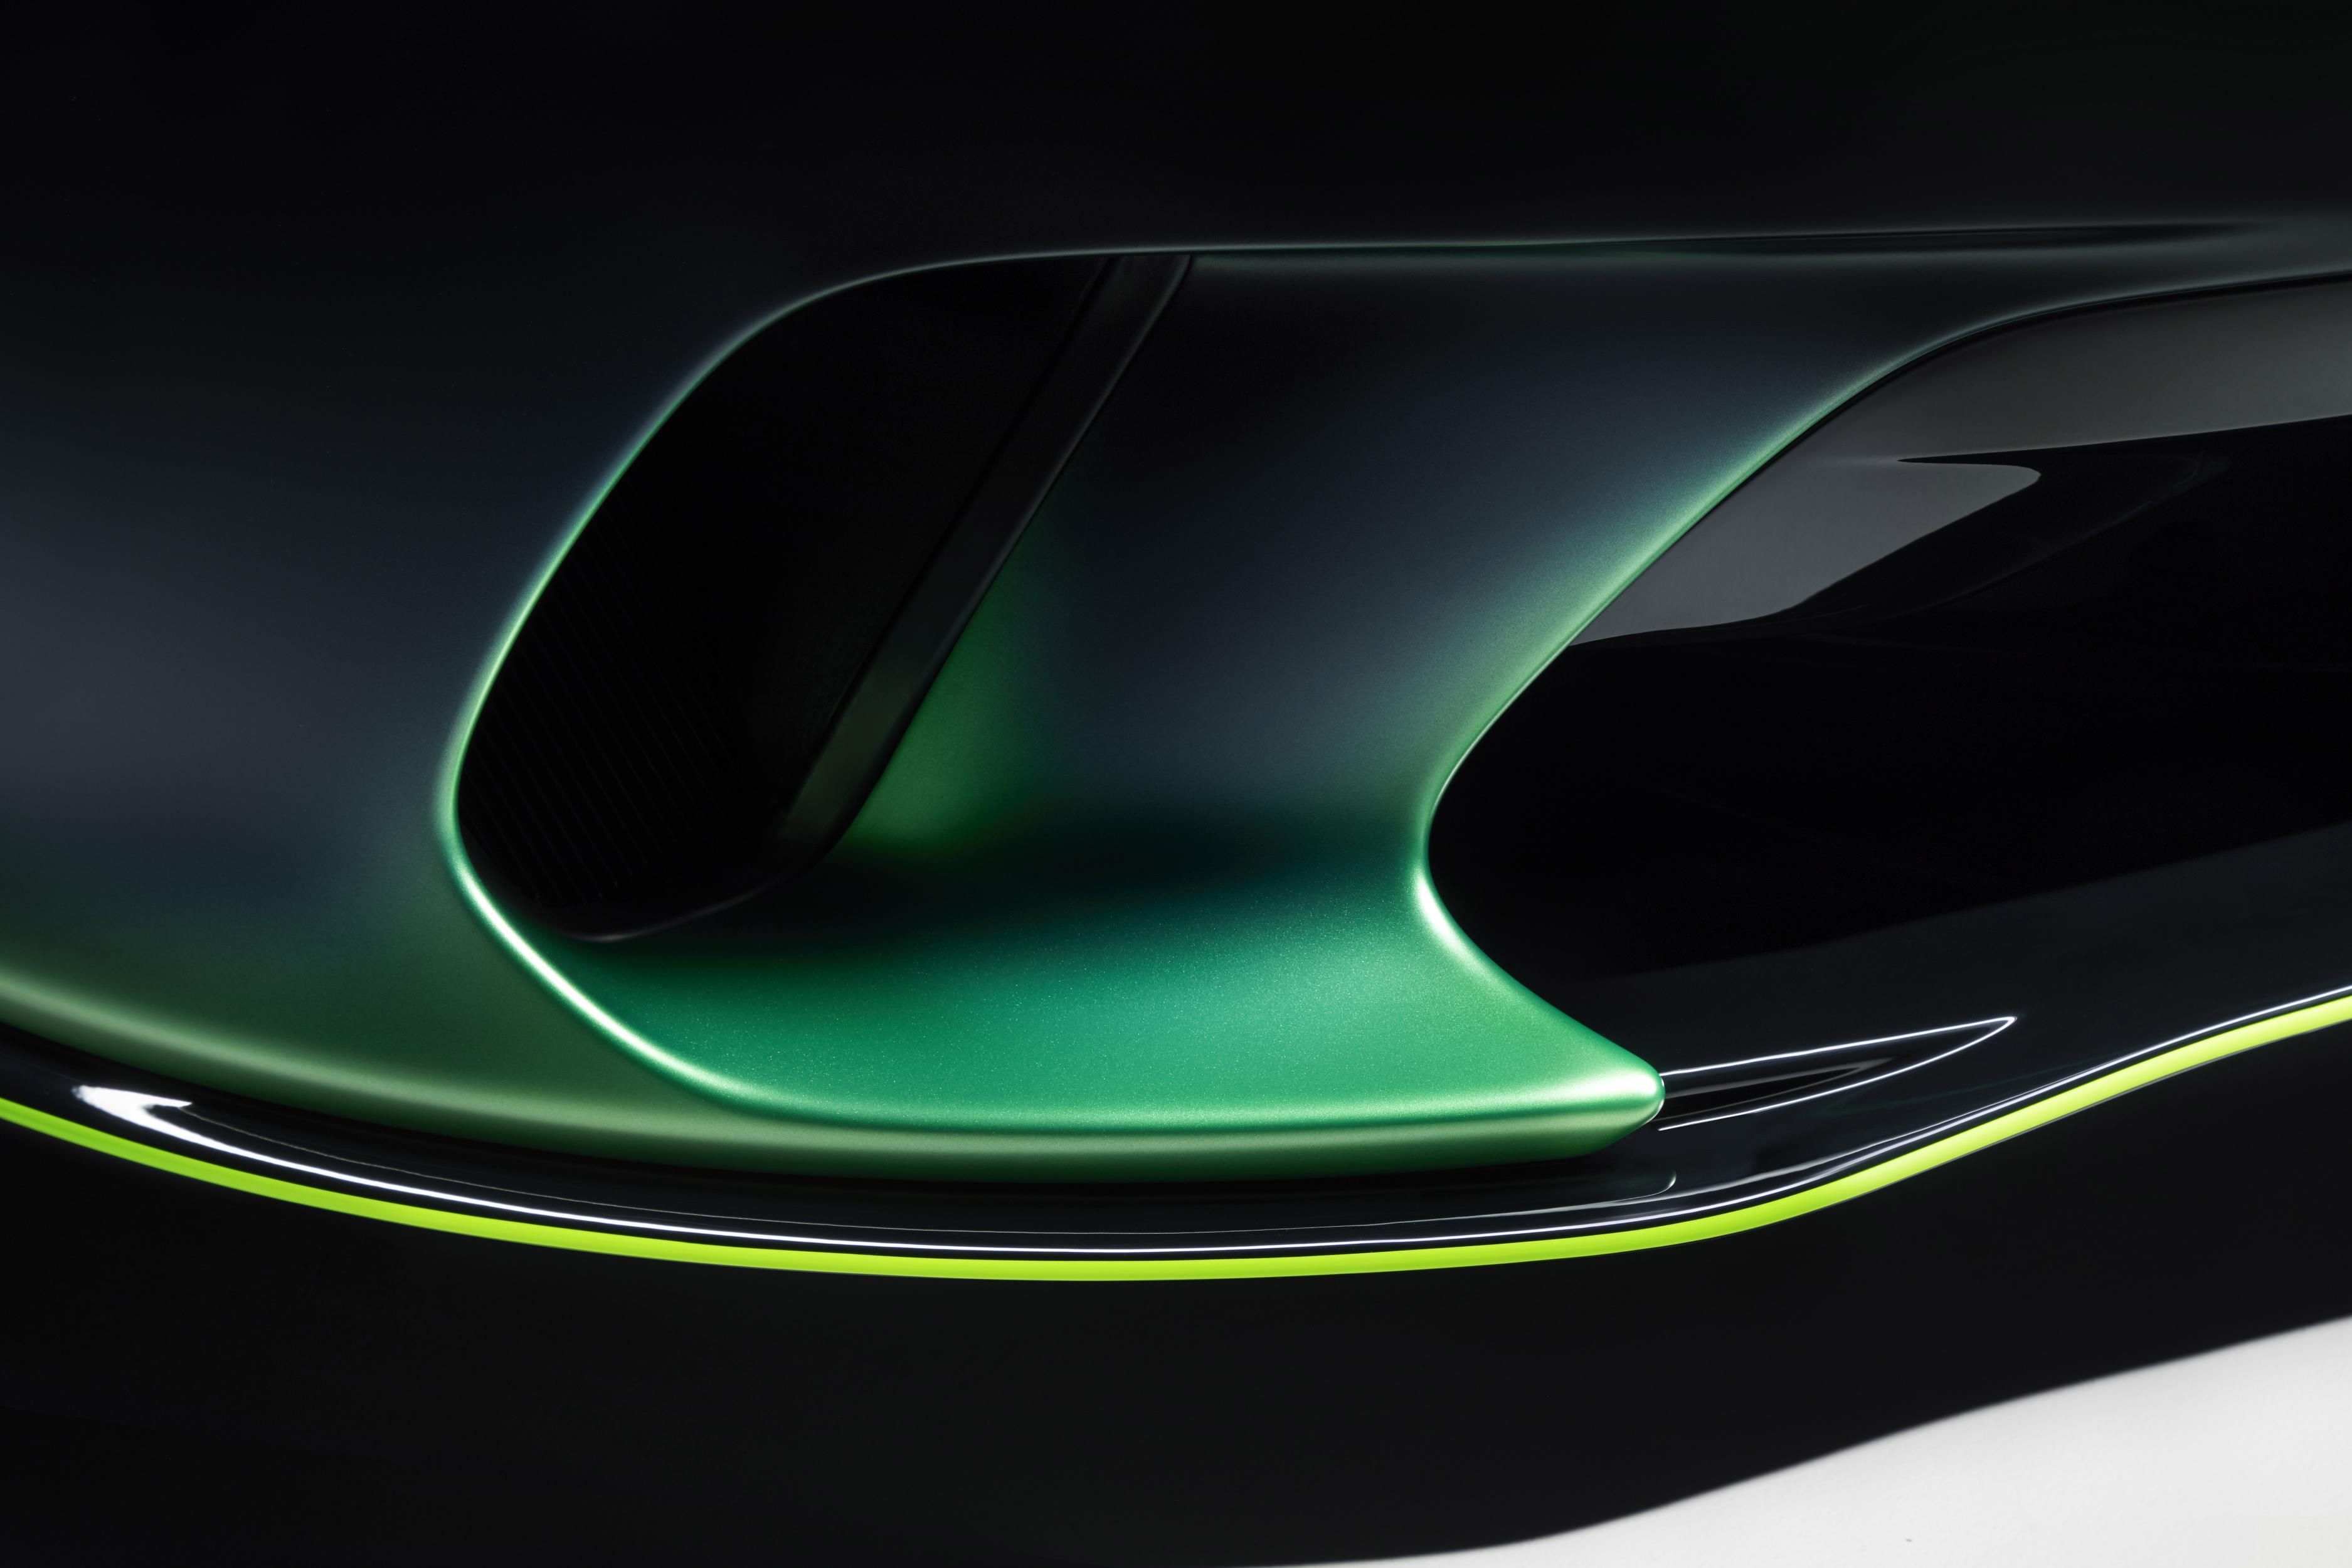 McLaren GT Verdant Theme Intakes